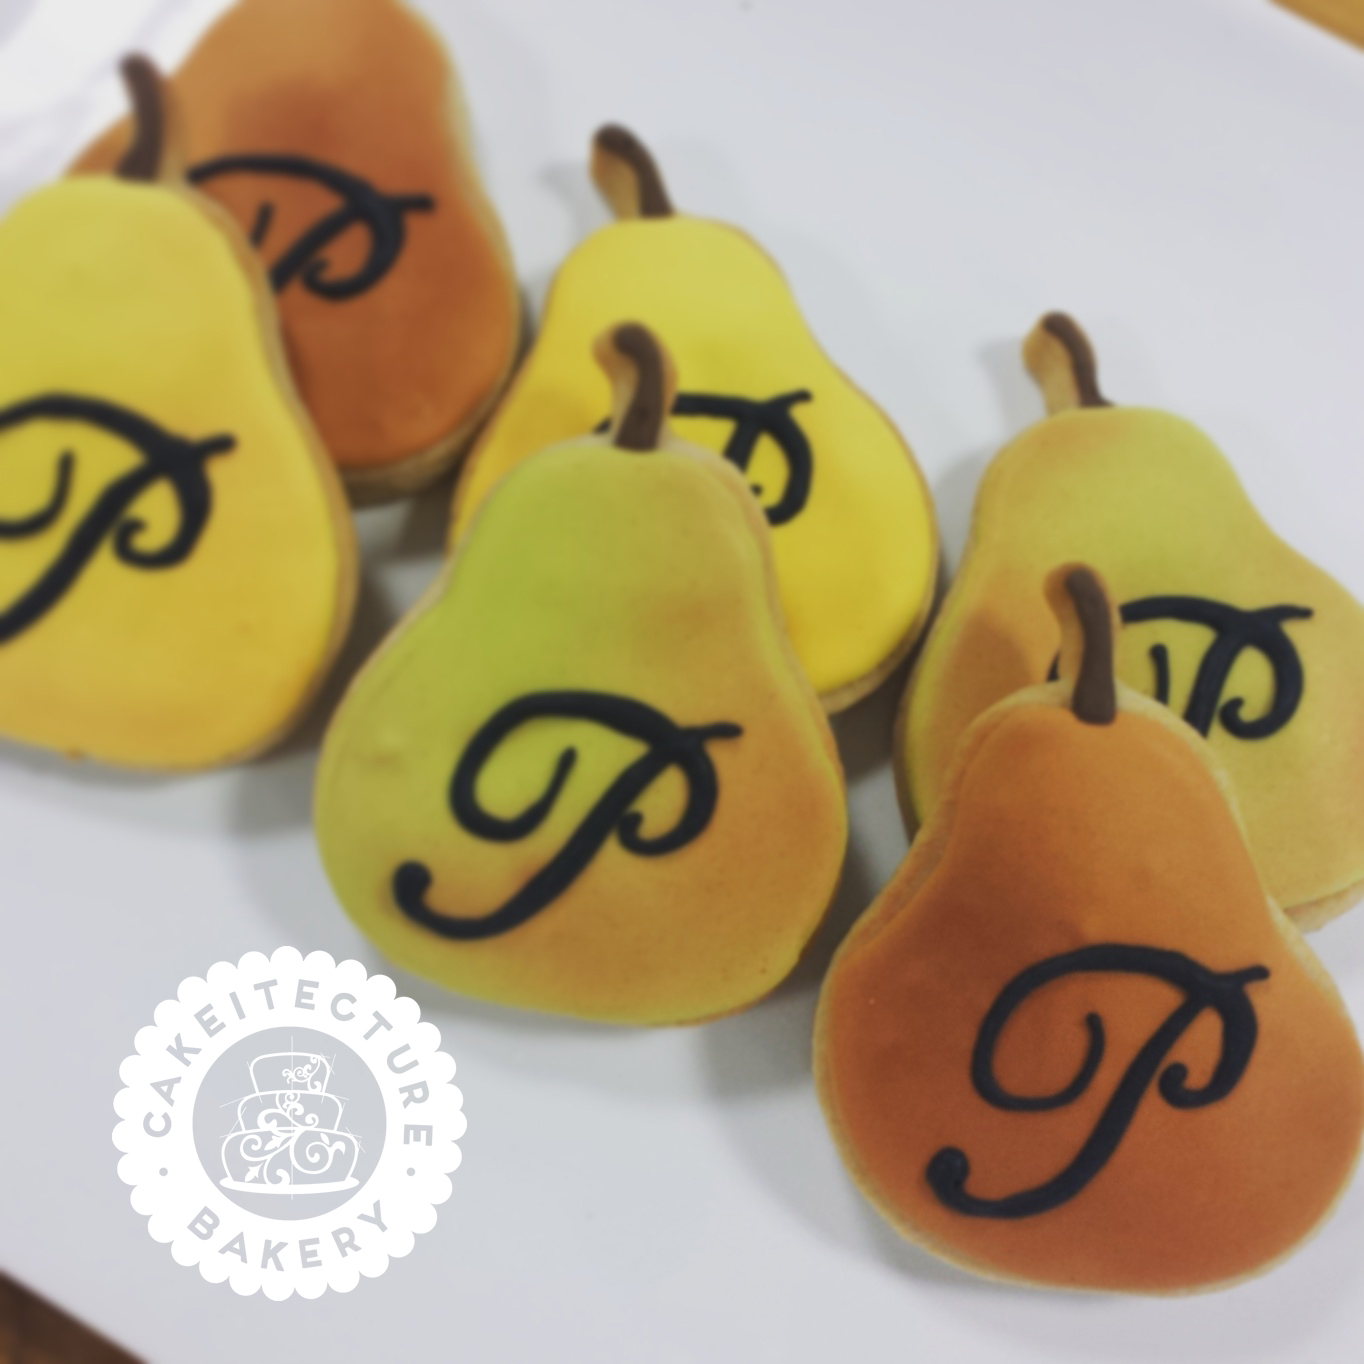 Cakeitecture Bakery pear cookies.jpg